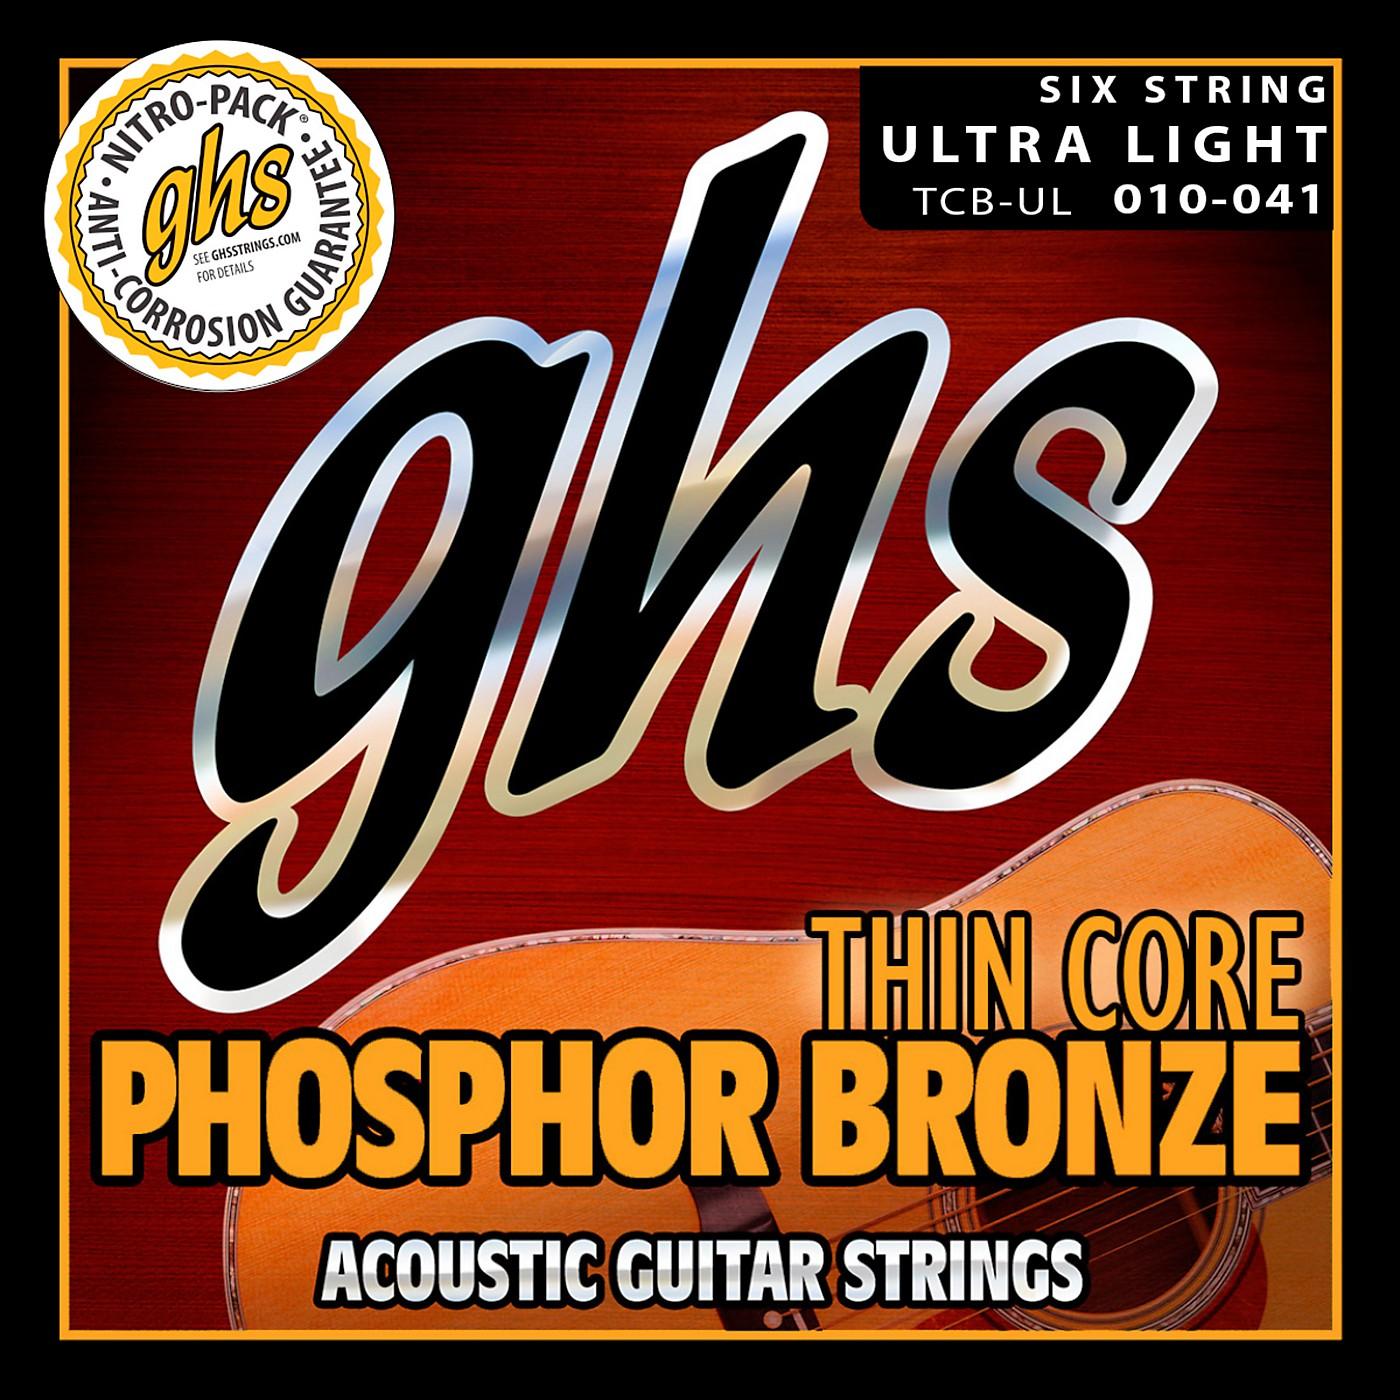 GHS Thin Core Phosphor Bronze Acoustics thumbnail